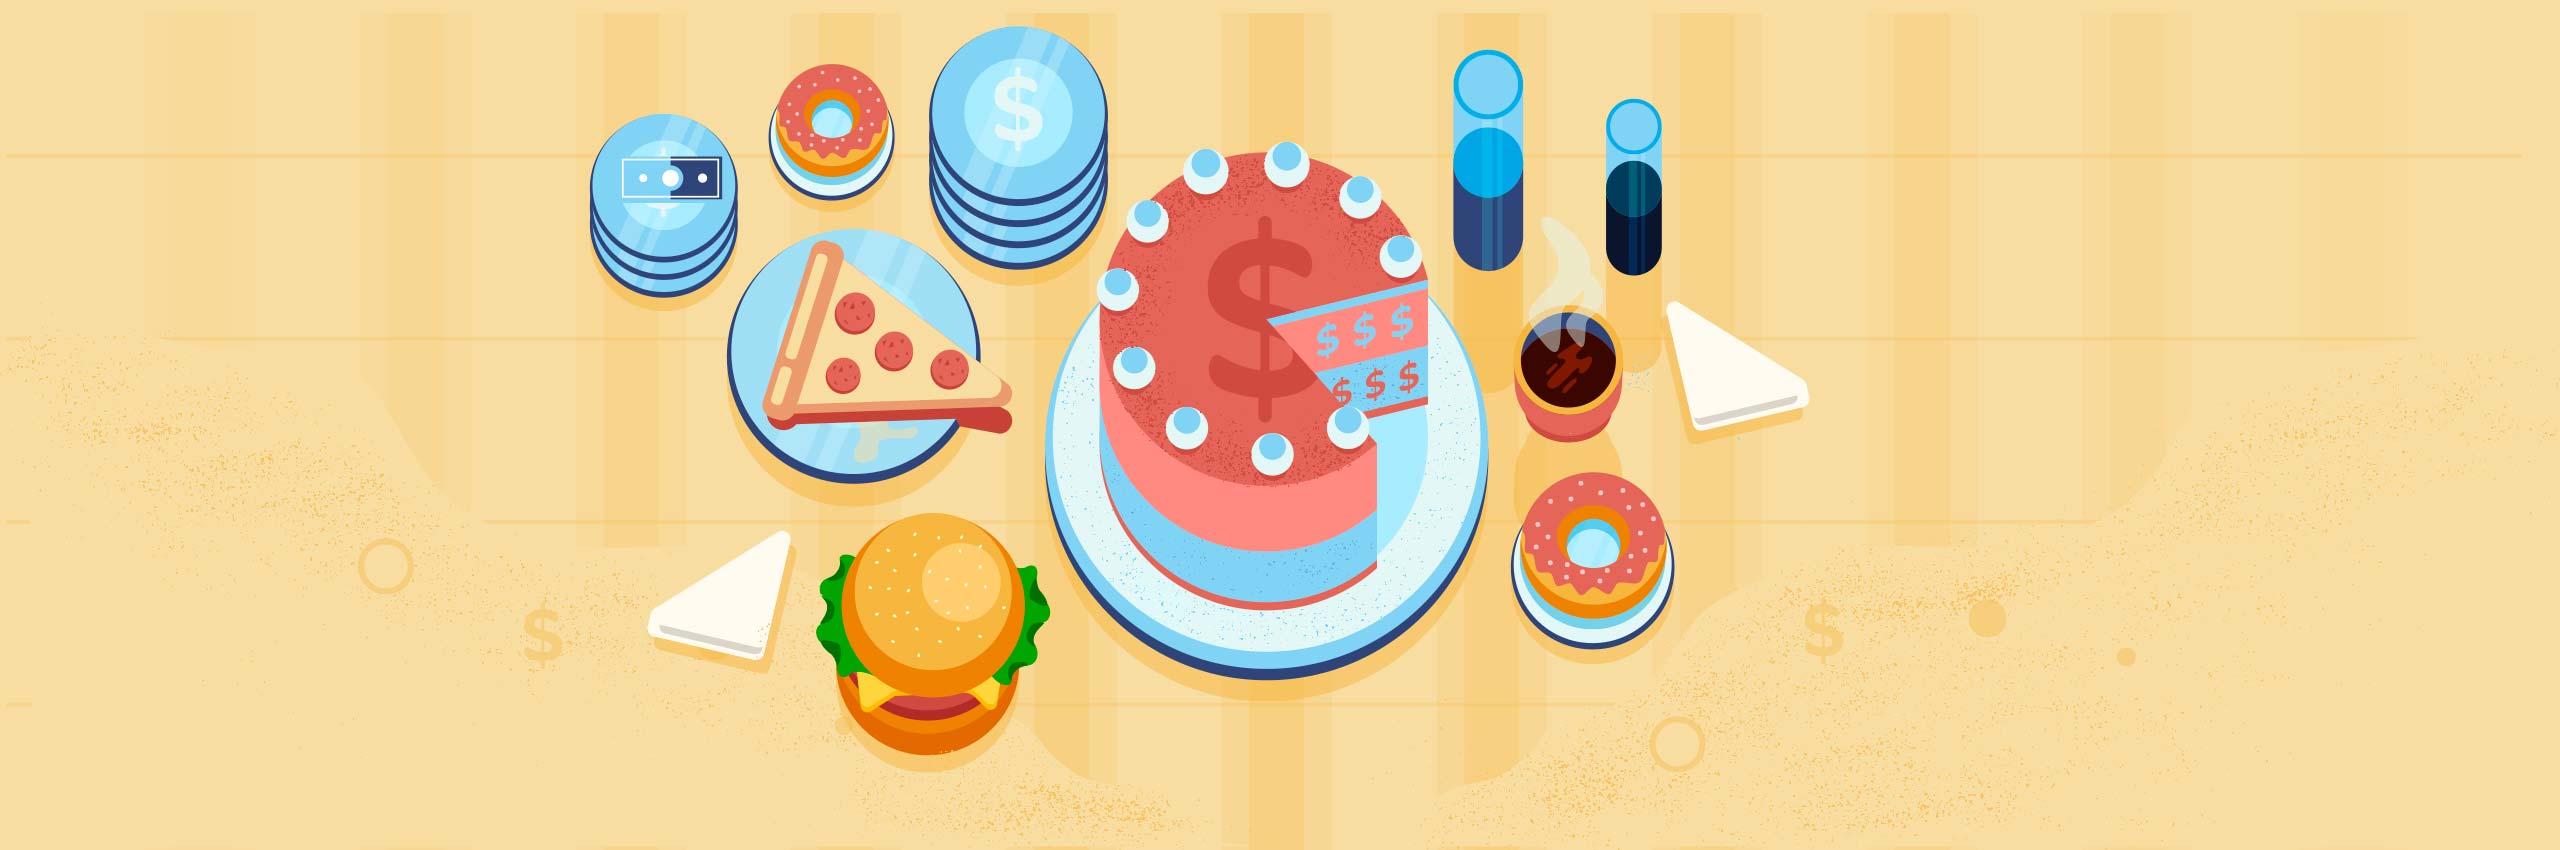 An illustration showing restaurant payroll